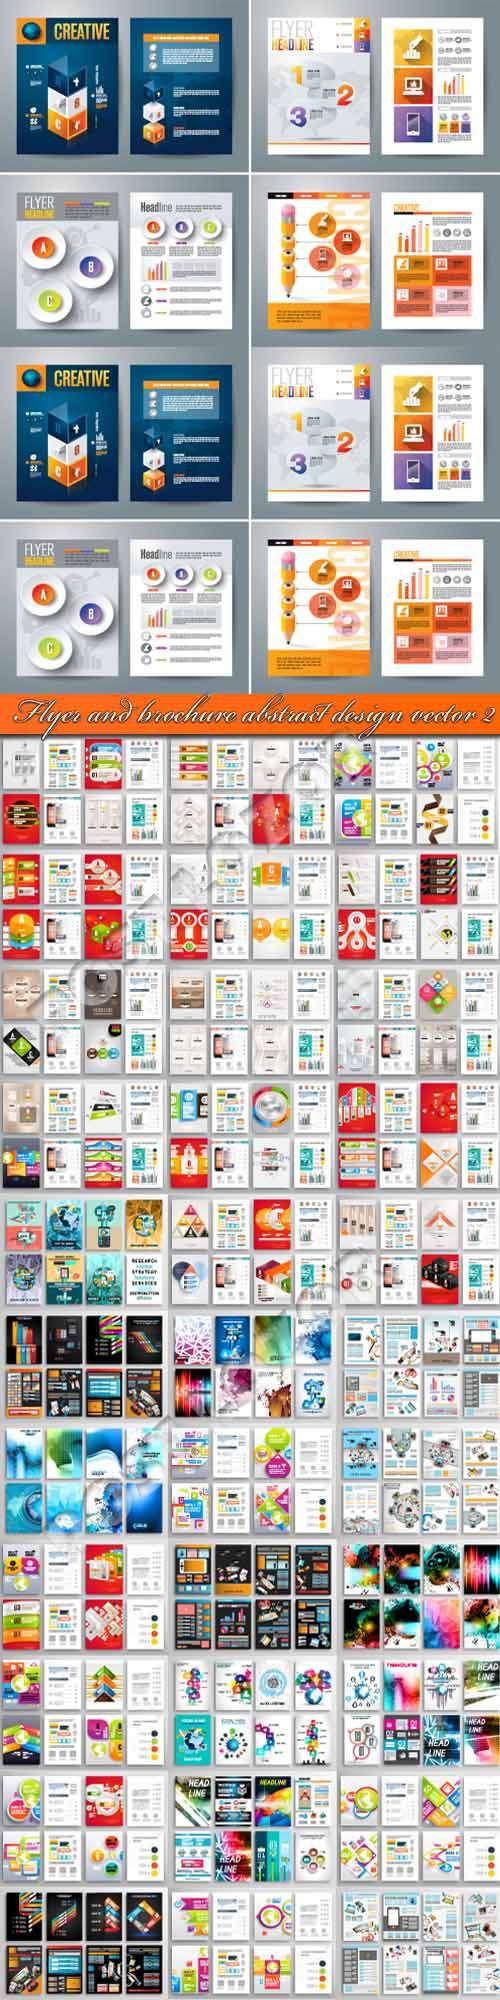 Флаер и брошюра абстрактный дизайн 2   Flyer and brochure abstract design vector 2